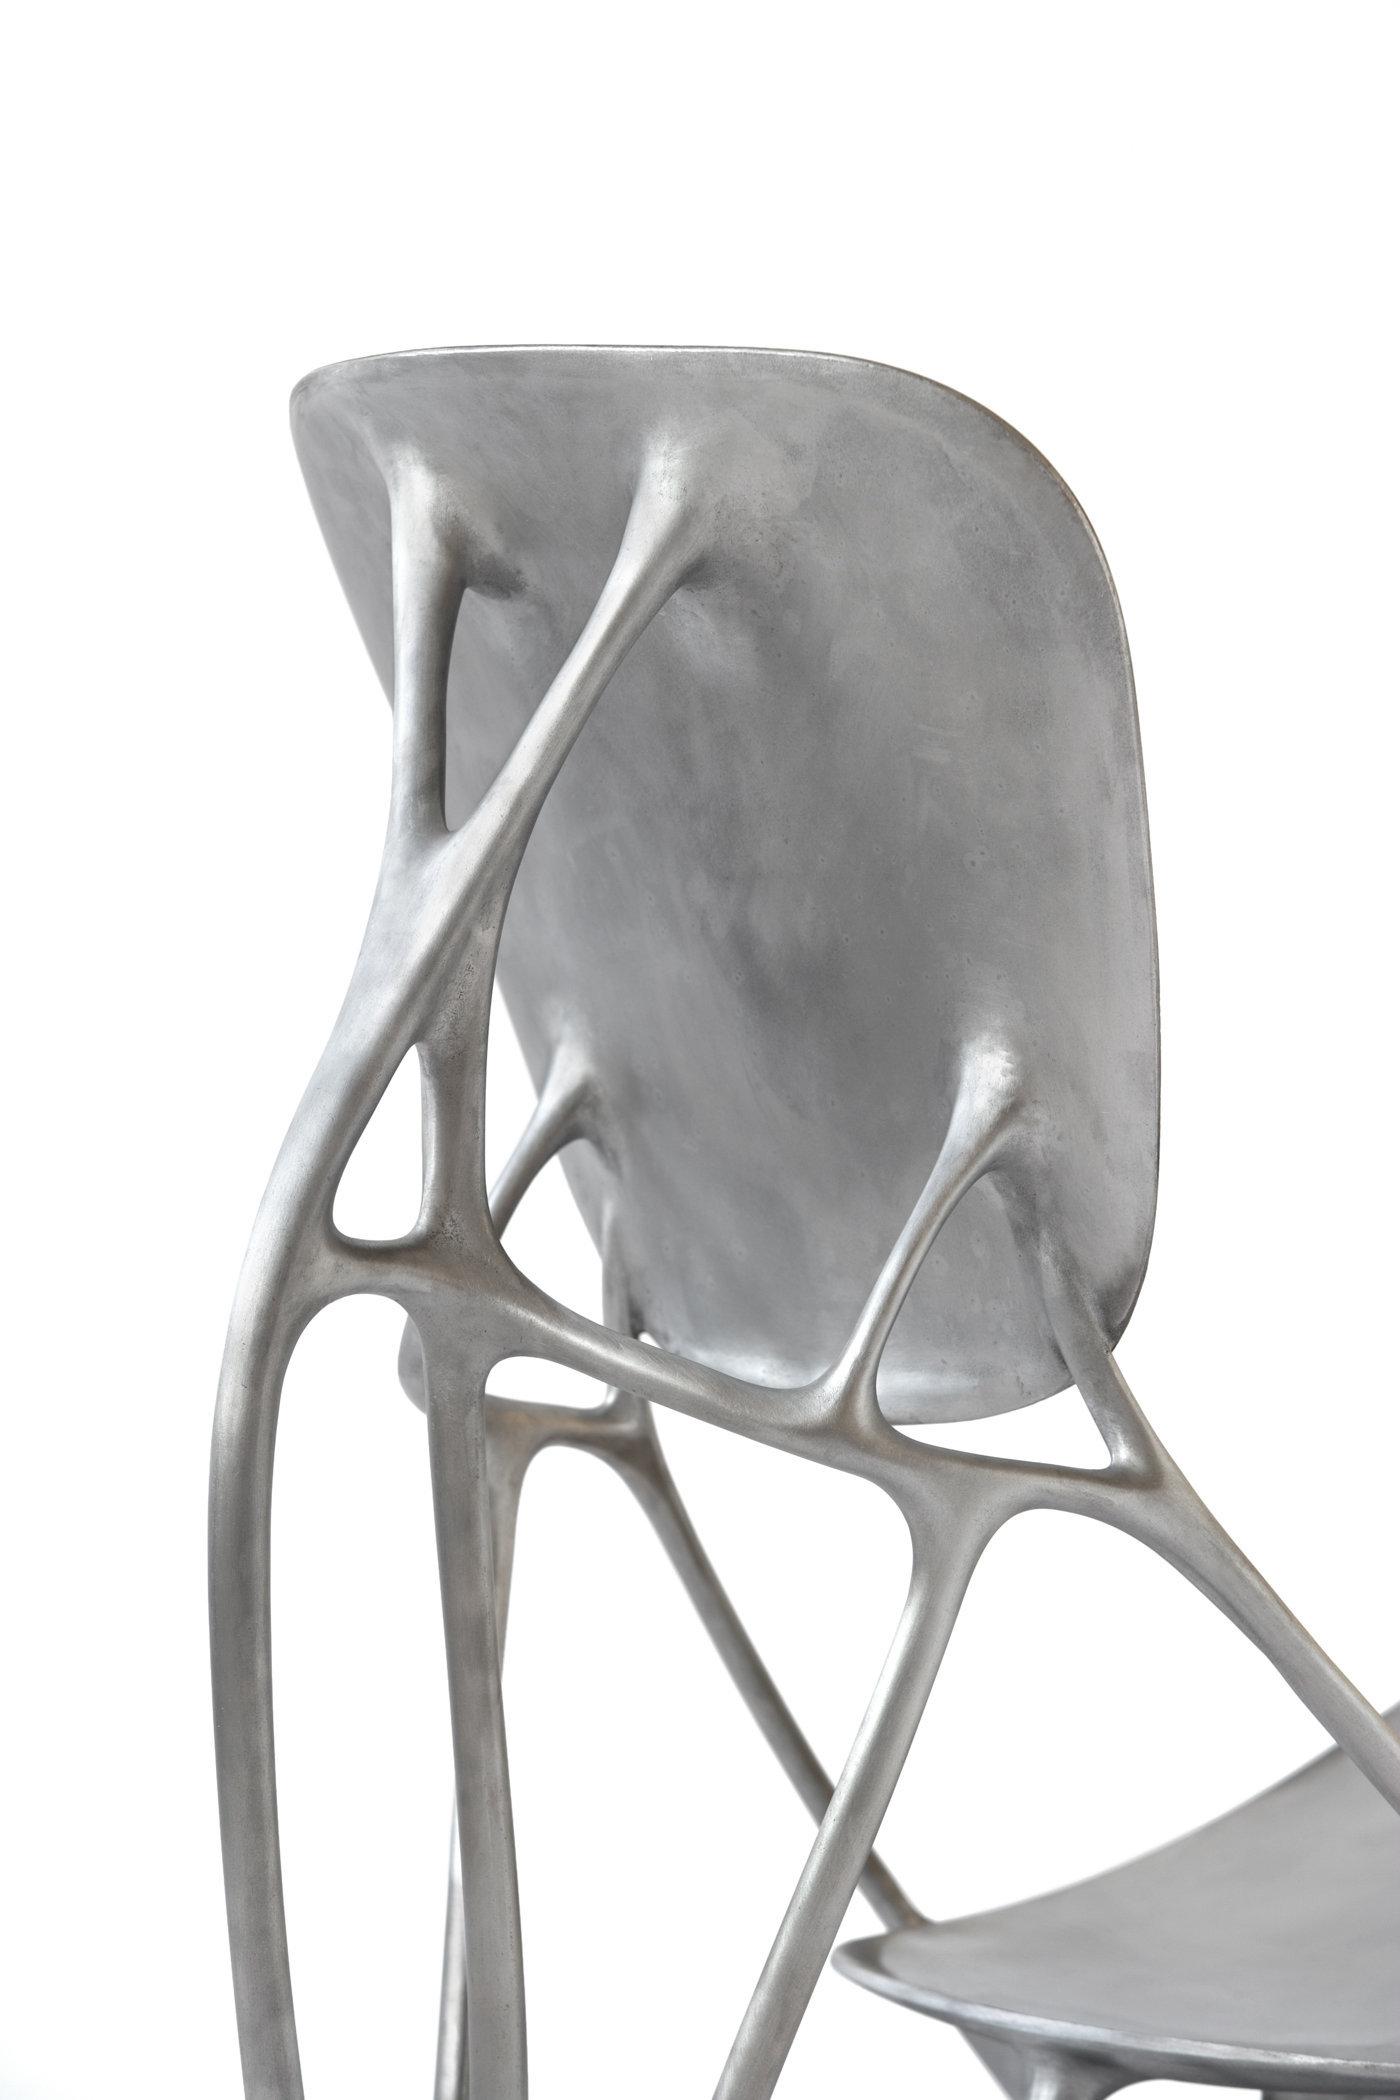 Aluminum Bone Chair (Prototype), Joris Laarman